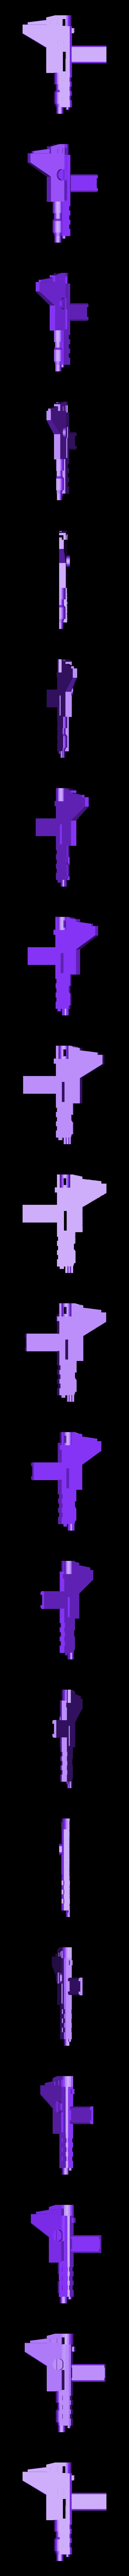 Gun5squarehandle.stl Download STL file KO TFC Uranos Upgrade Kit IDW Ver • 3D printer object, Toymakr3D